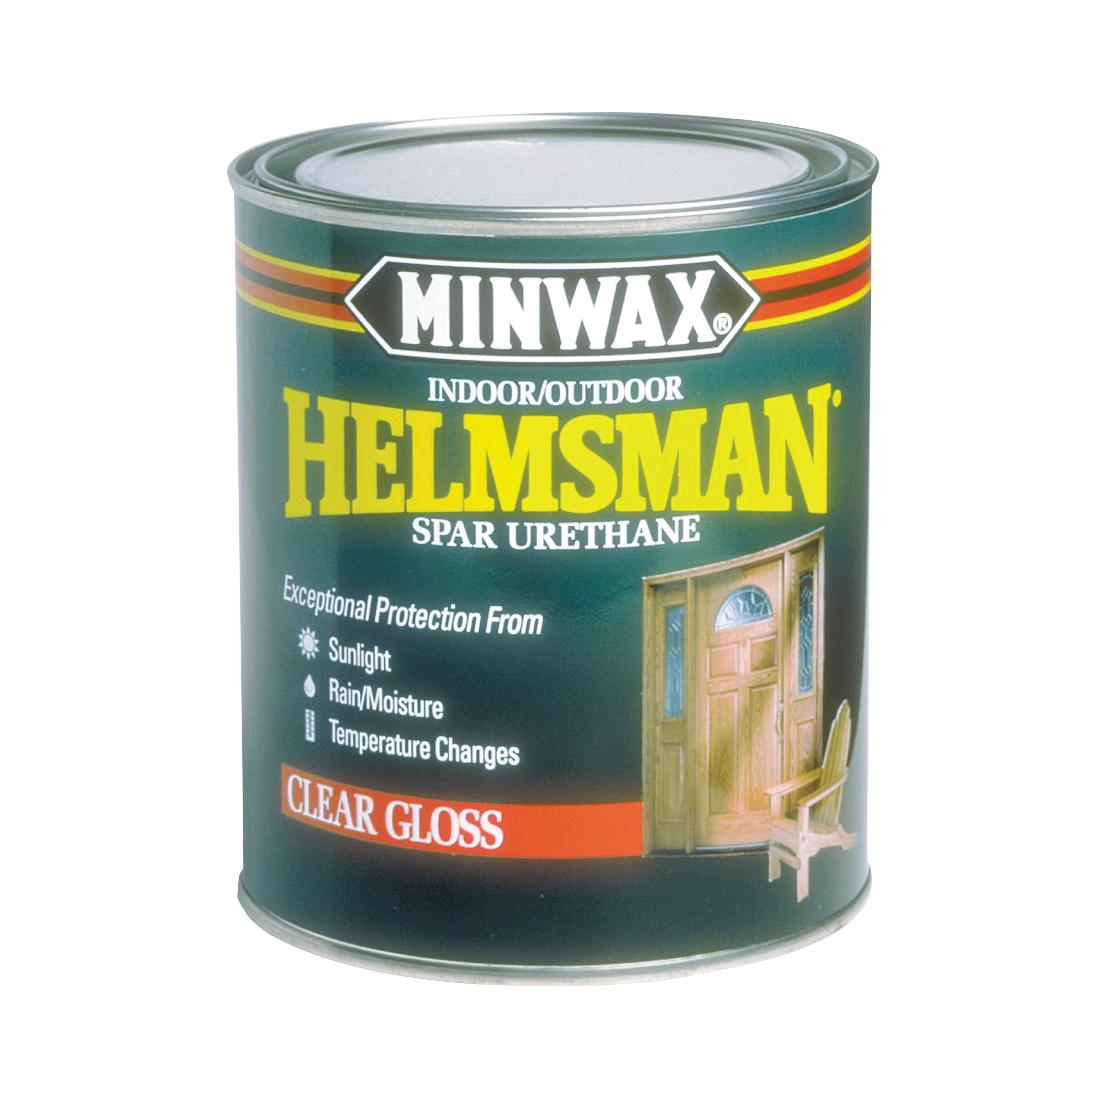 Picture of Minwax Helmsman 63200444 Spar Urethane Paint, High-Gloss, Clear, Liquid, 1 qt, Can